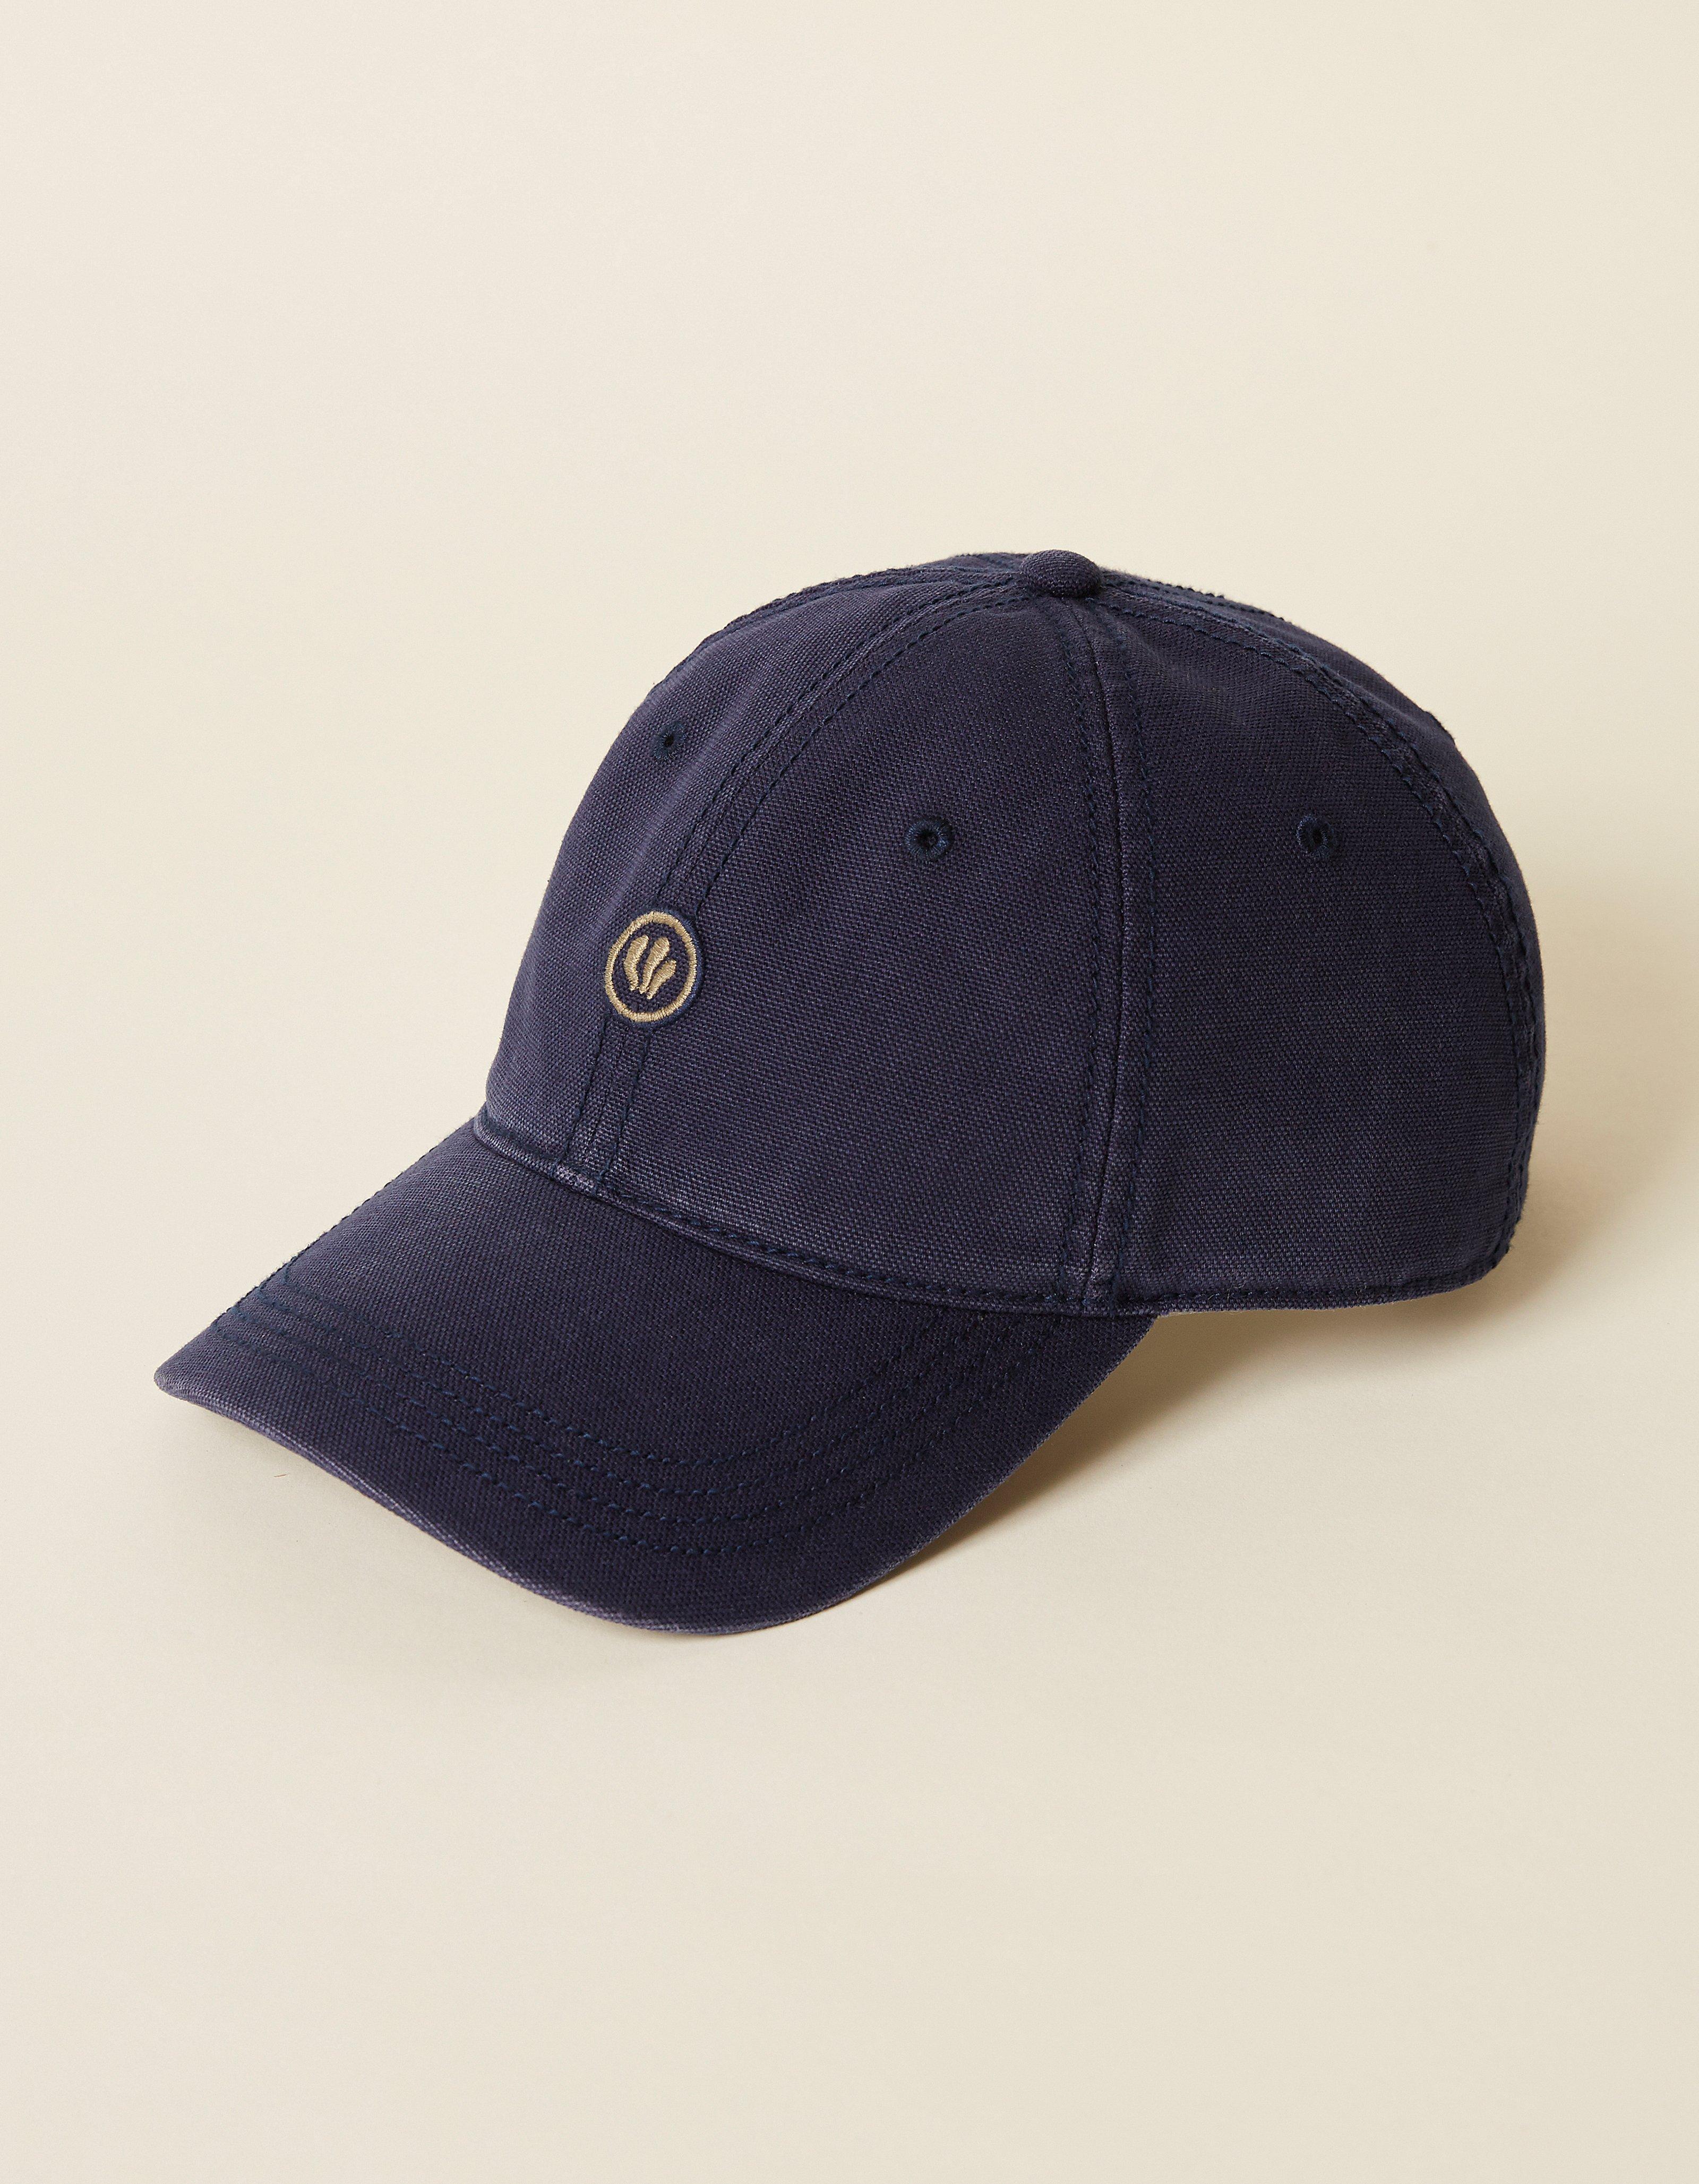 Navy Plain Baseball Cap 90501b3dd8a